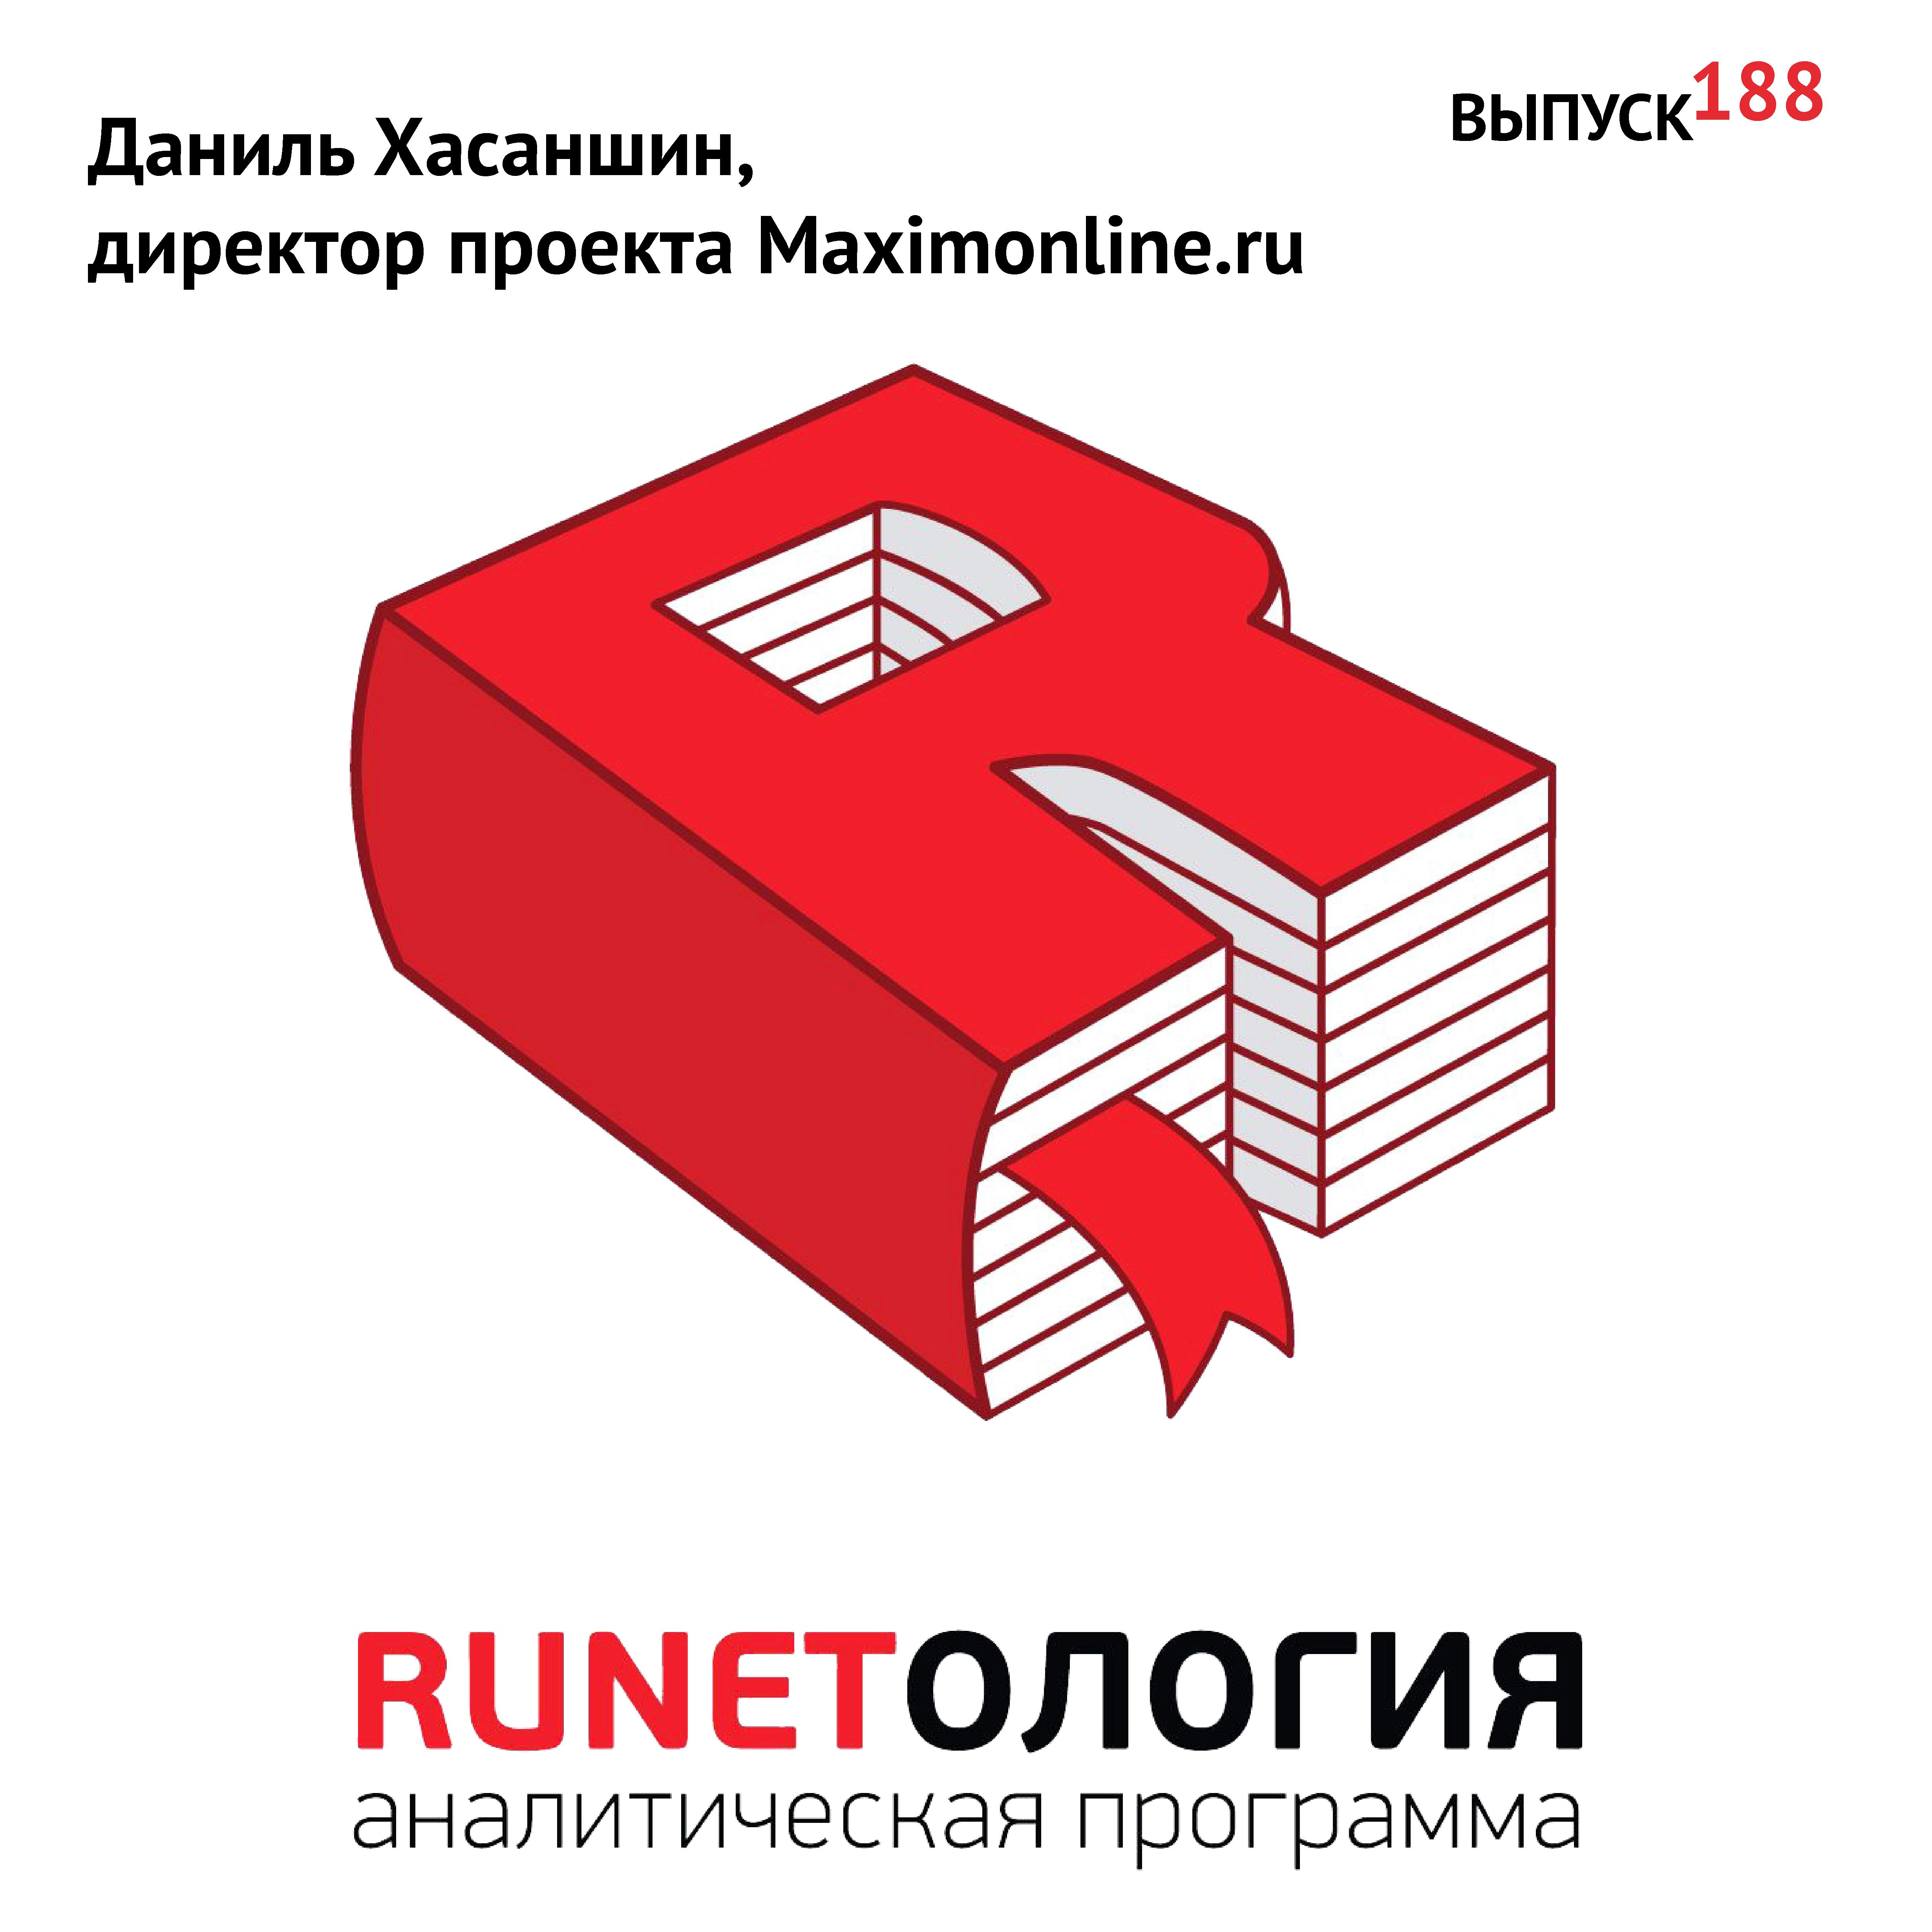 Даниль Хасаншин, директор проекта Maximonline.ru